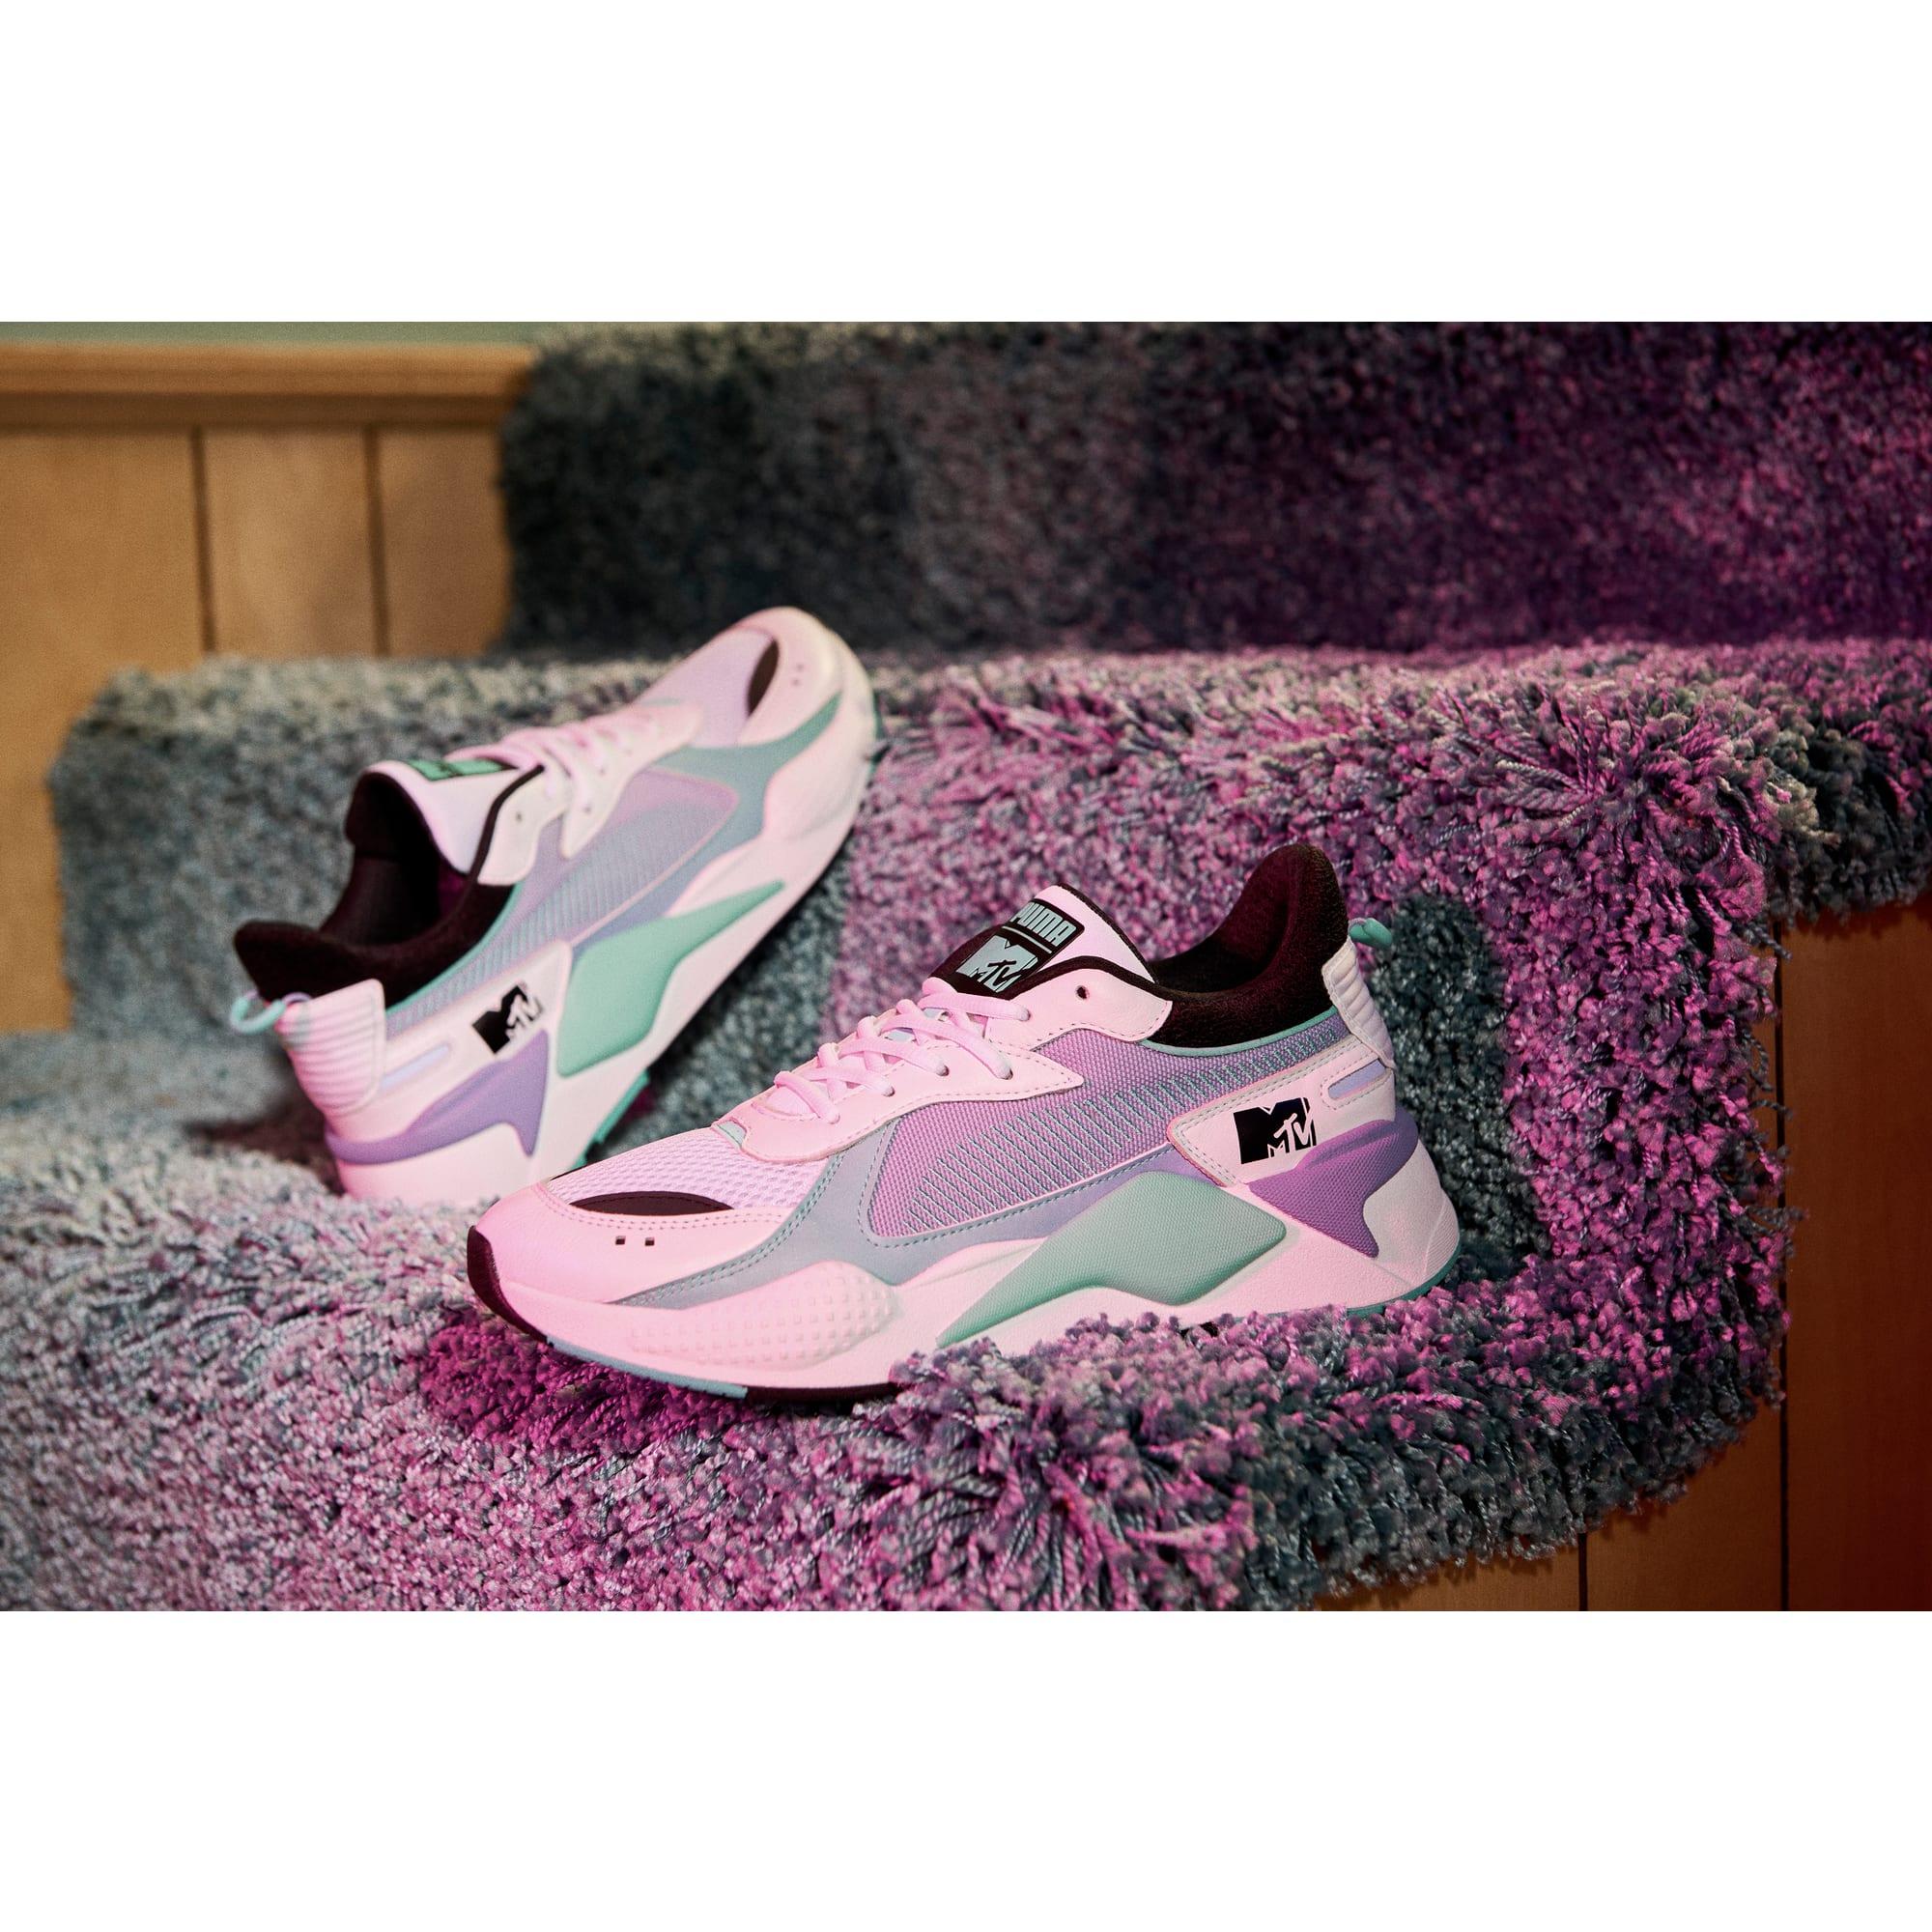 PUMA x MTV RS X Tracks Pastel 1 Trainers